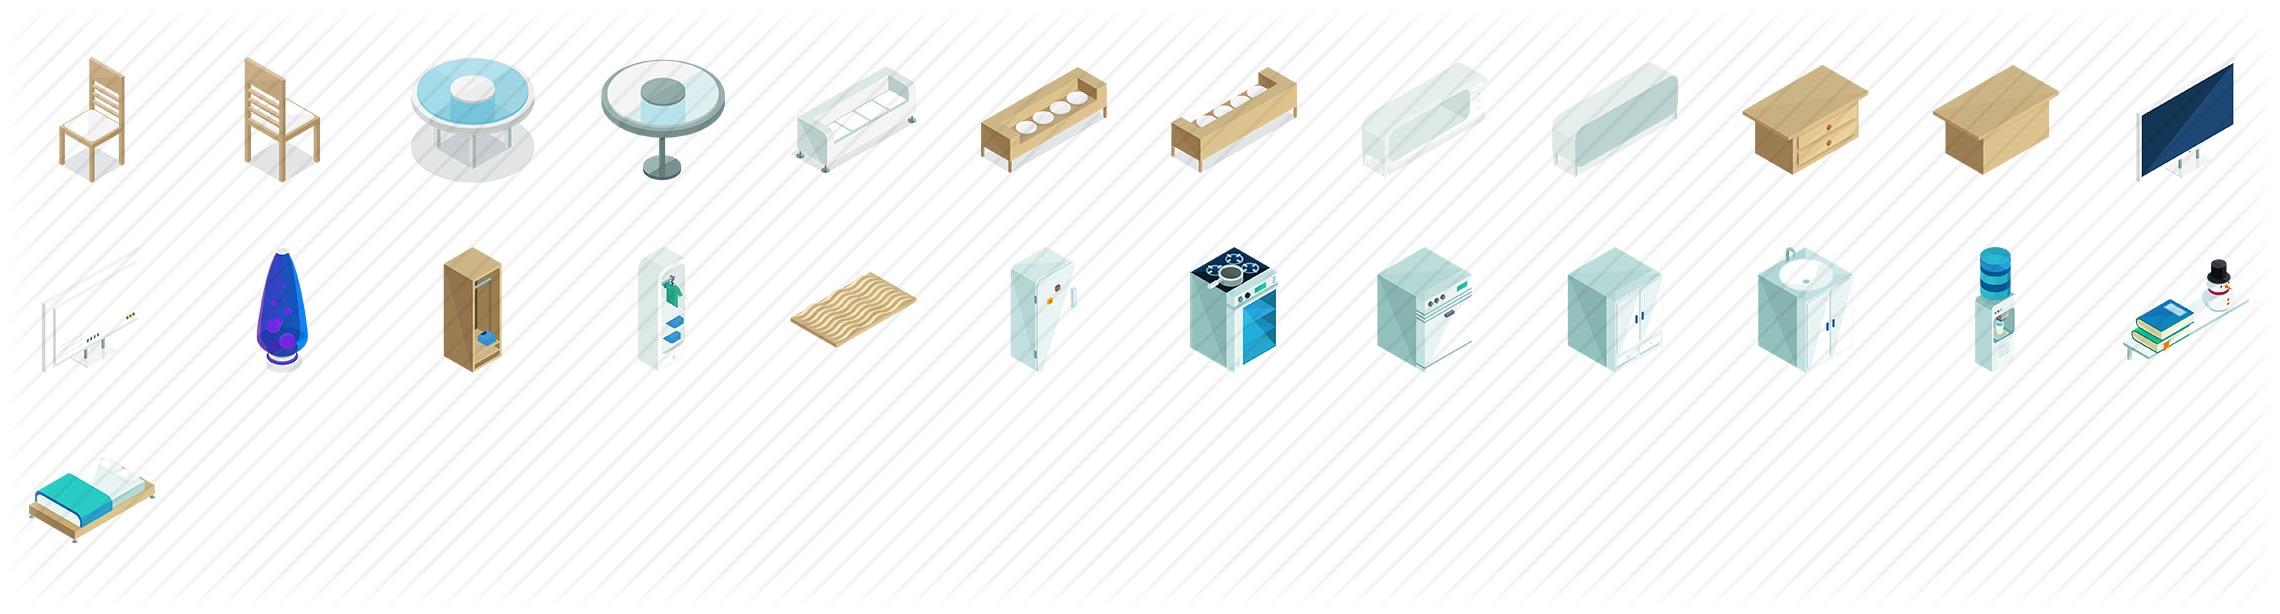 Furniture Isometric Icons